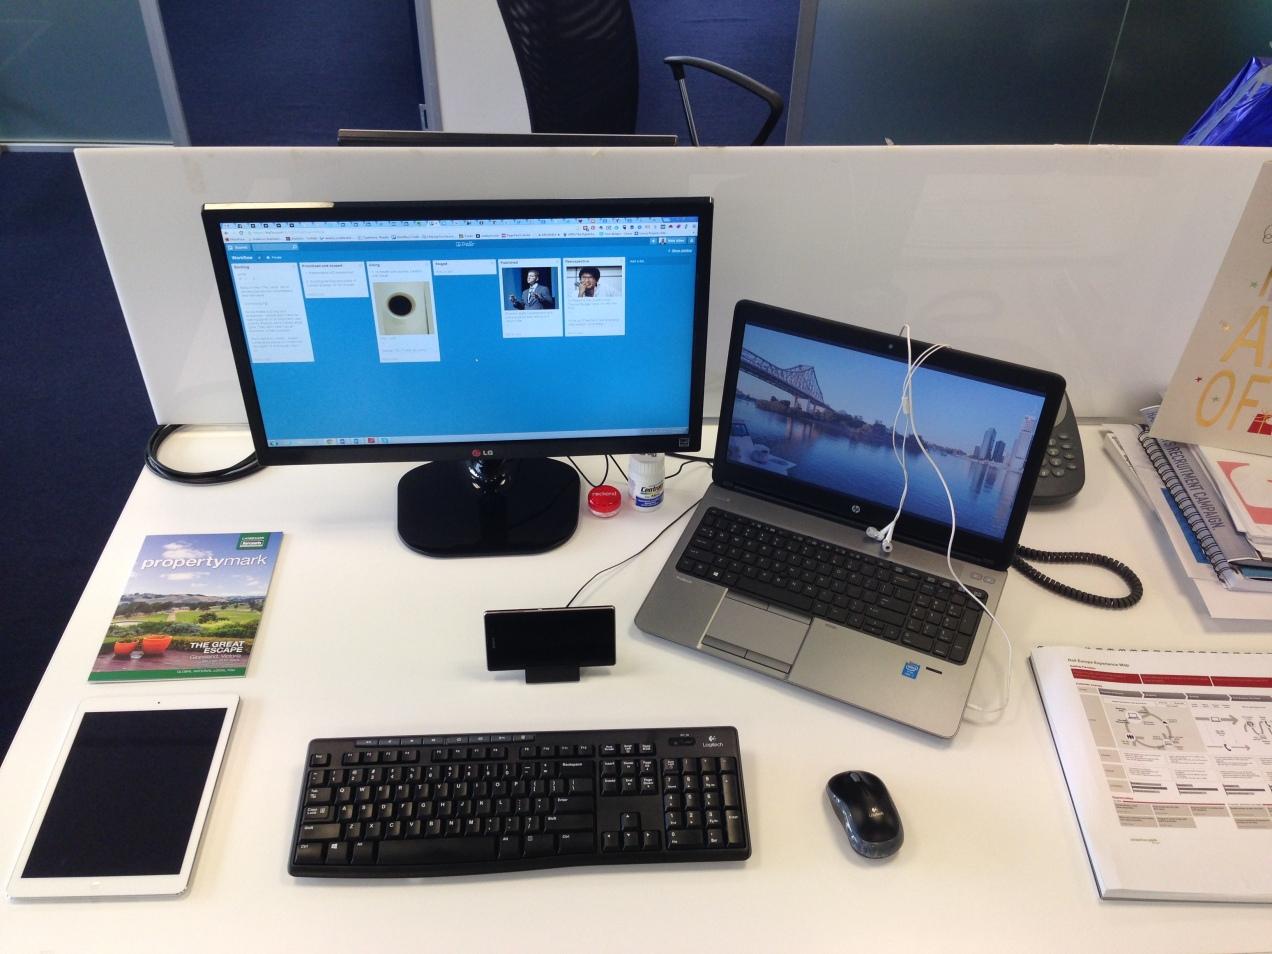 My Desktop, HP ProBook, Sony Z1 and iPad Air